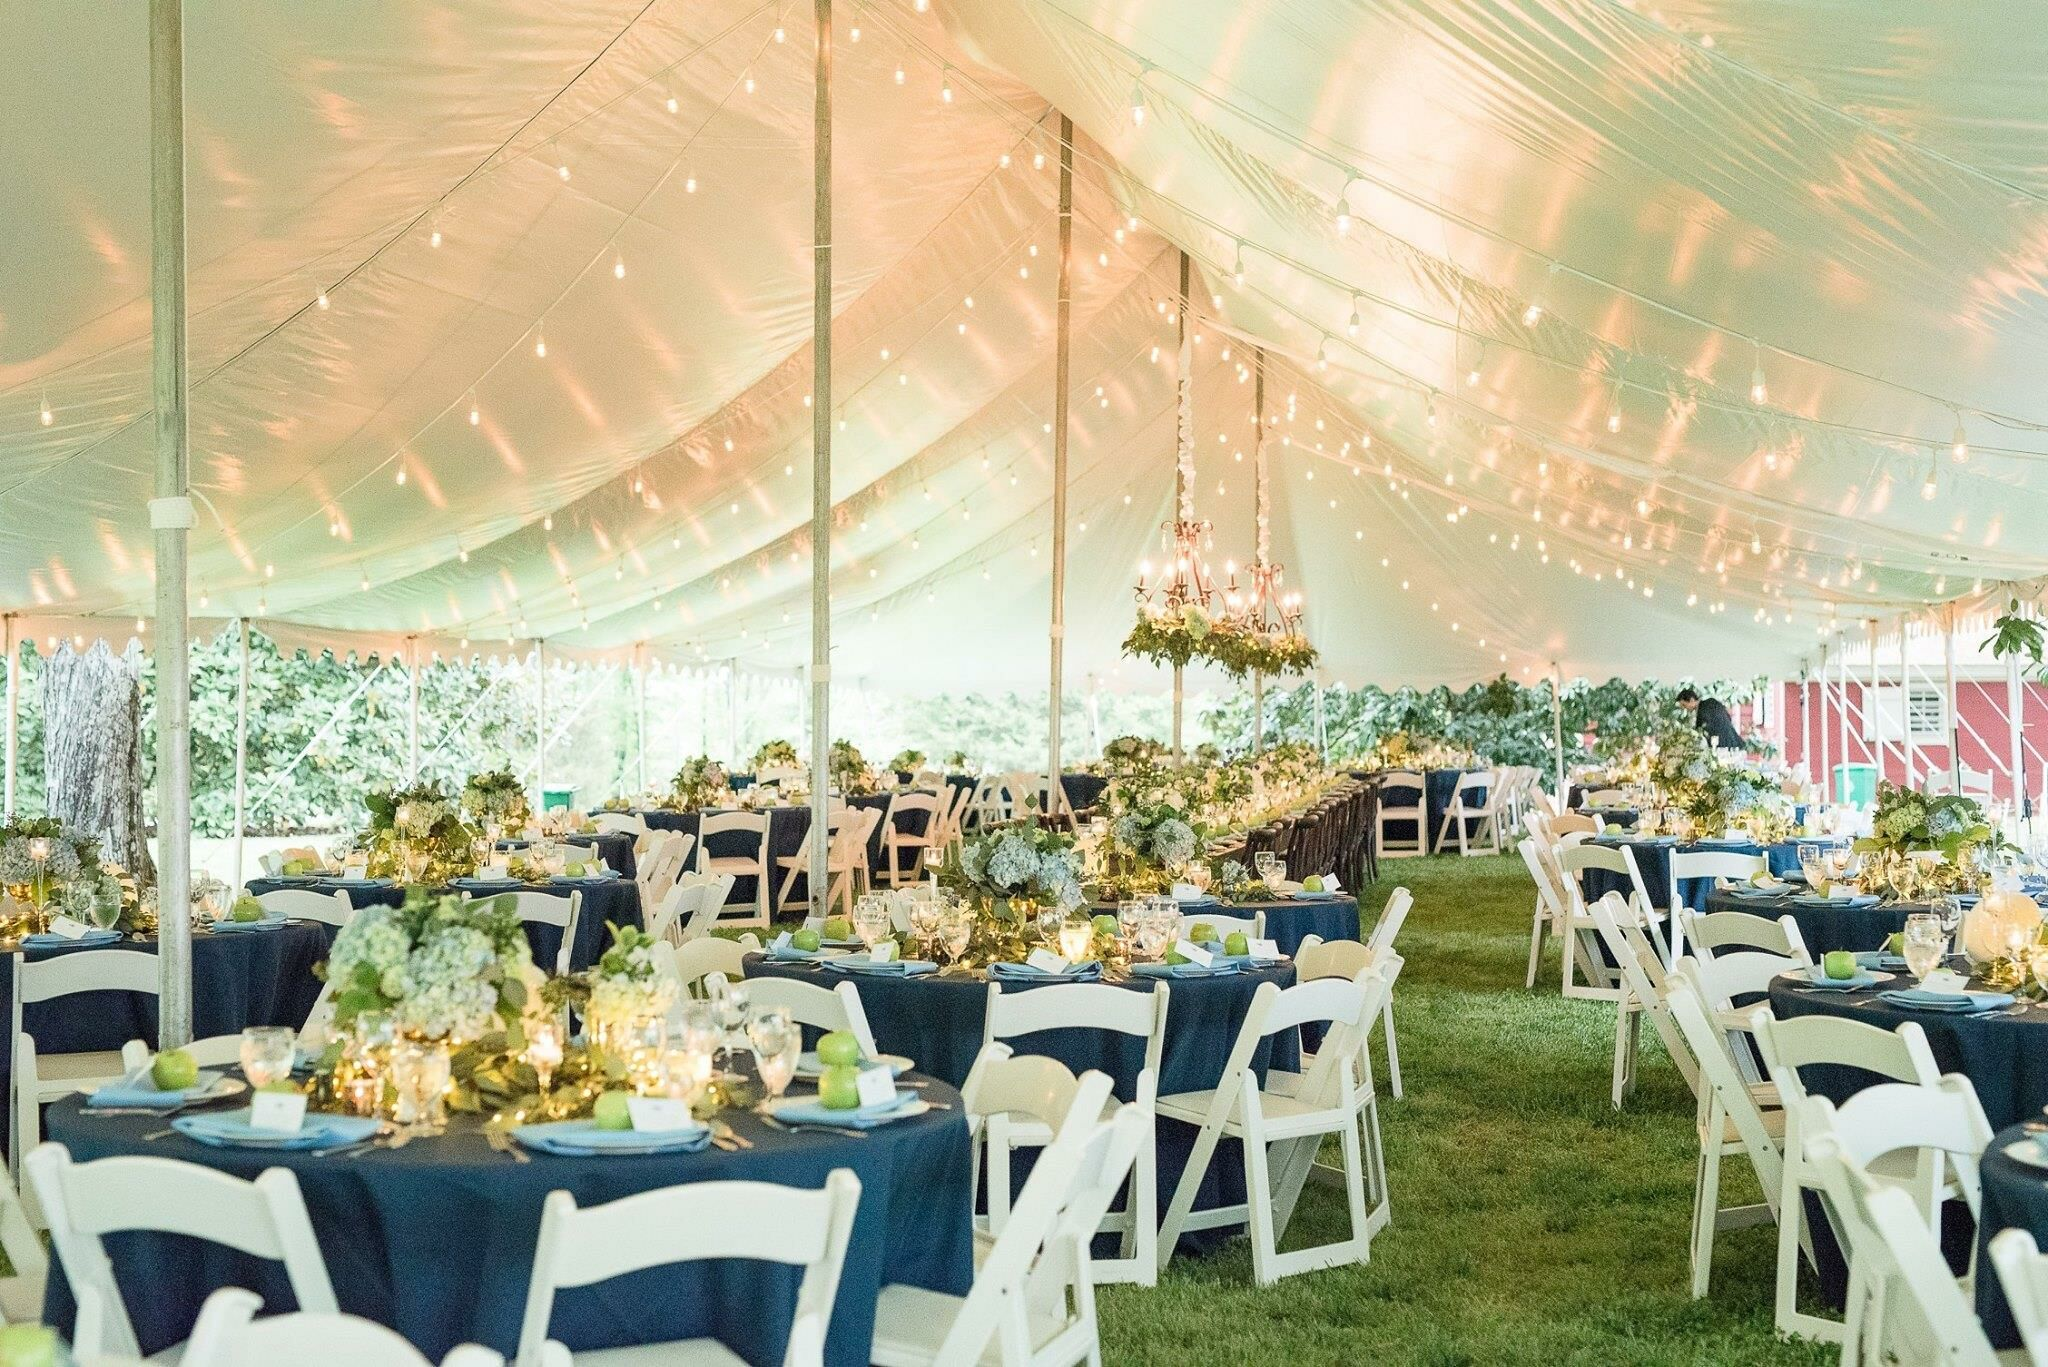 Wedding Rentals In Harrisonburg Va The Knot